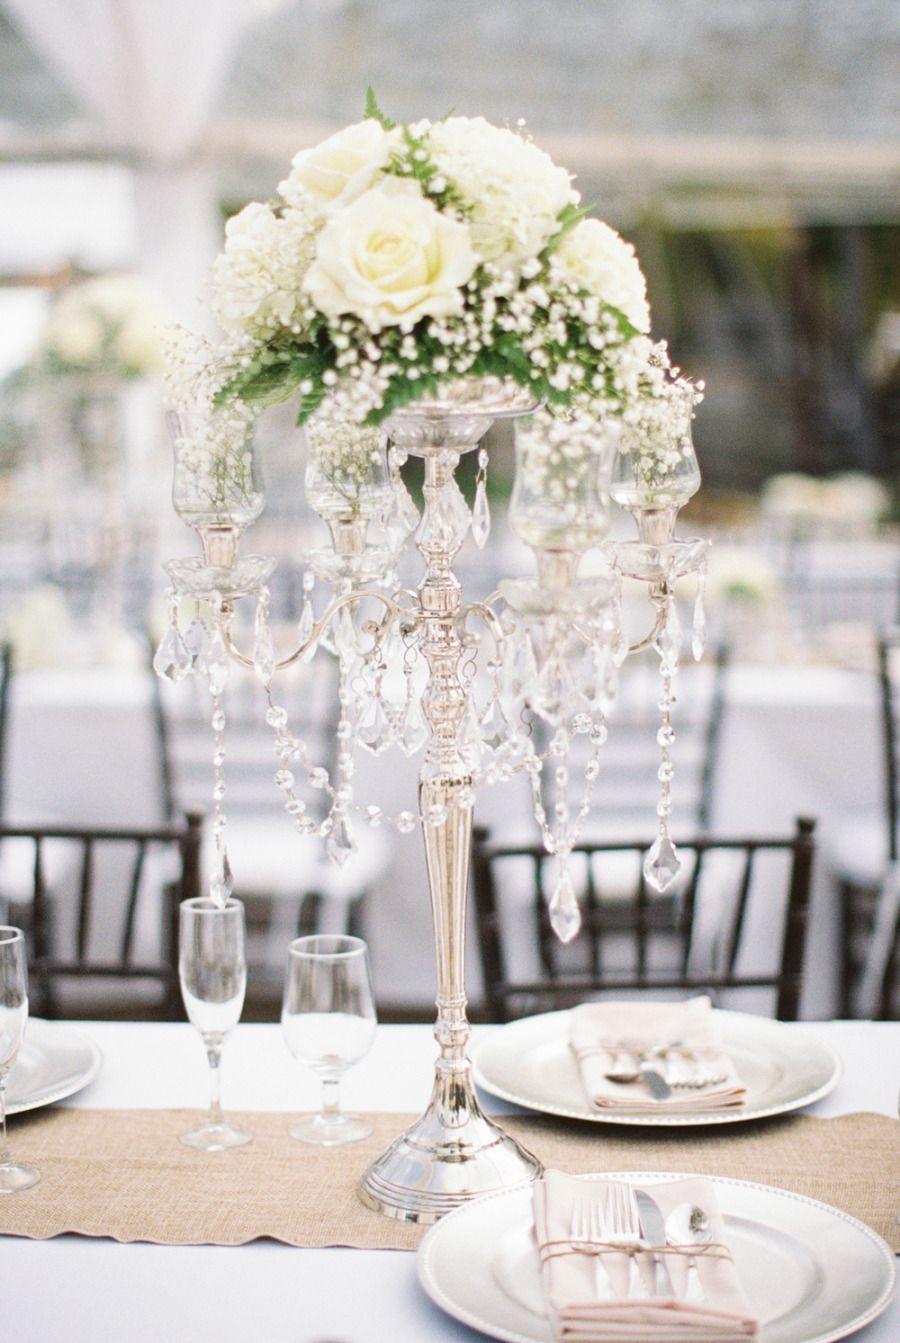 Simple White Wedding Centerpieces